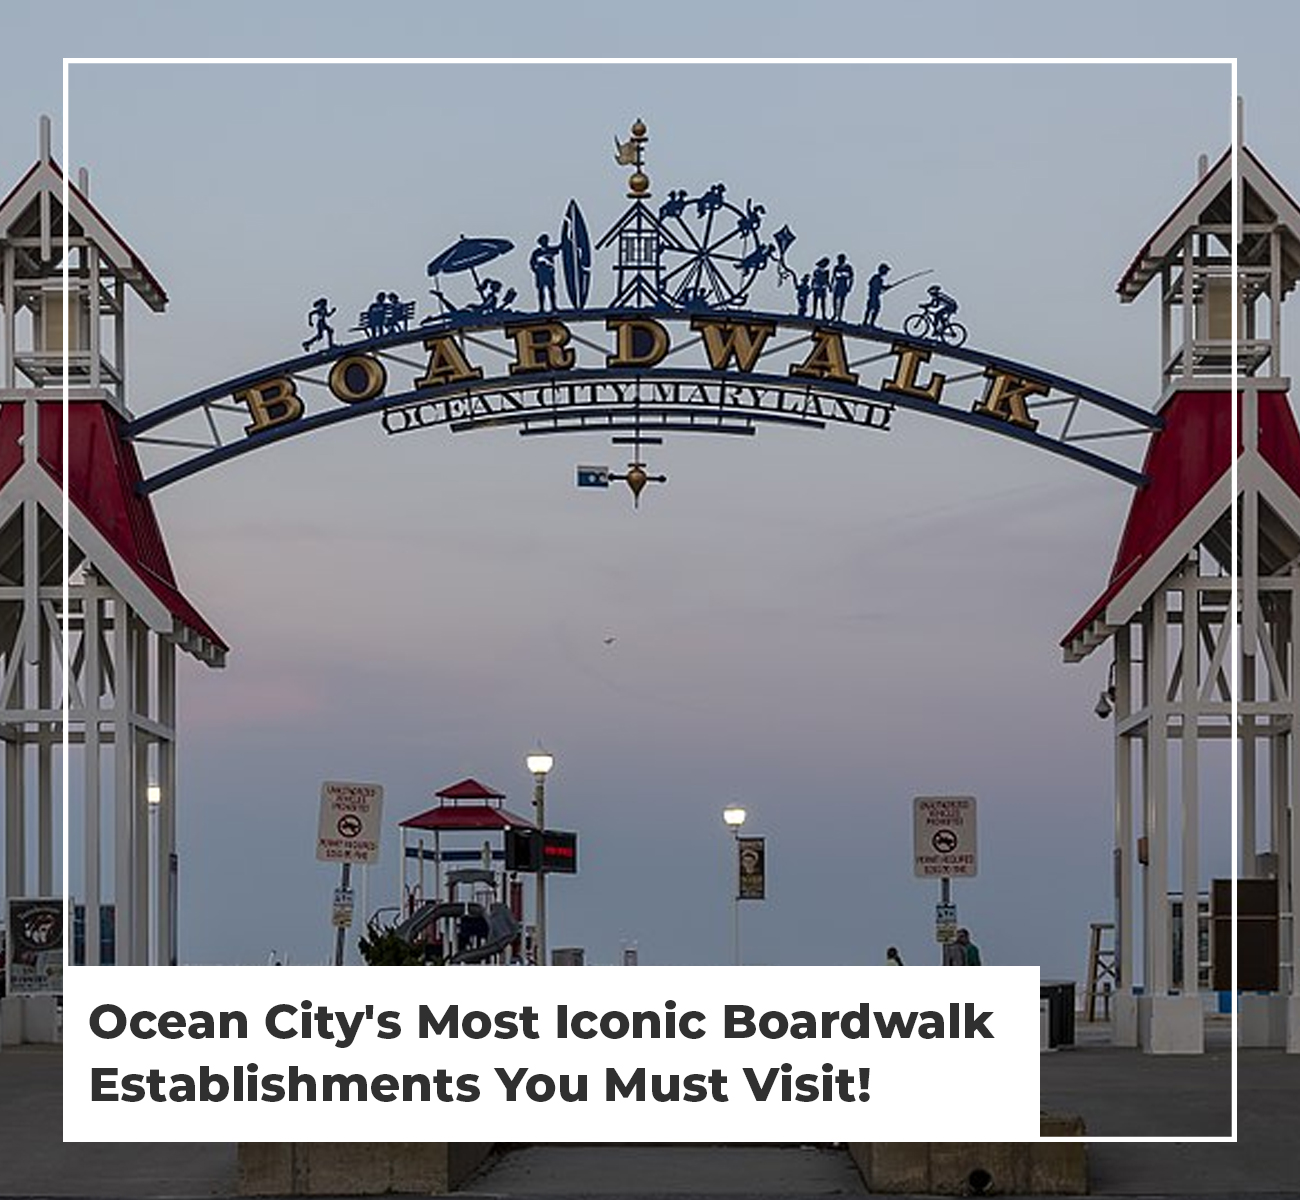 Ocean City's Boardwalk Establishments